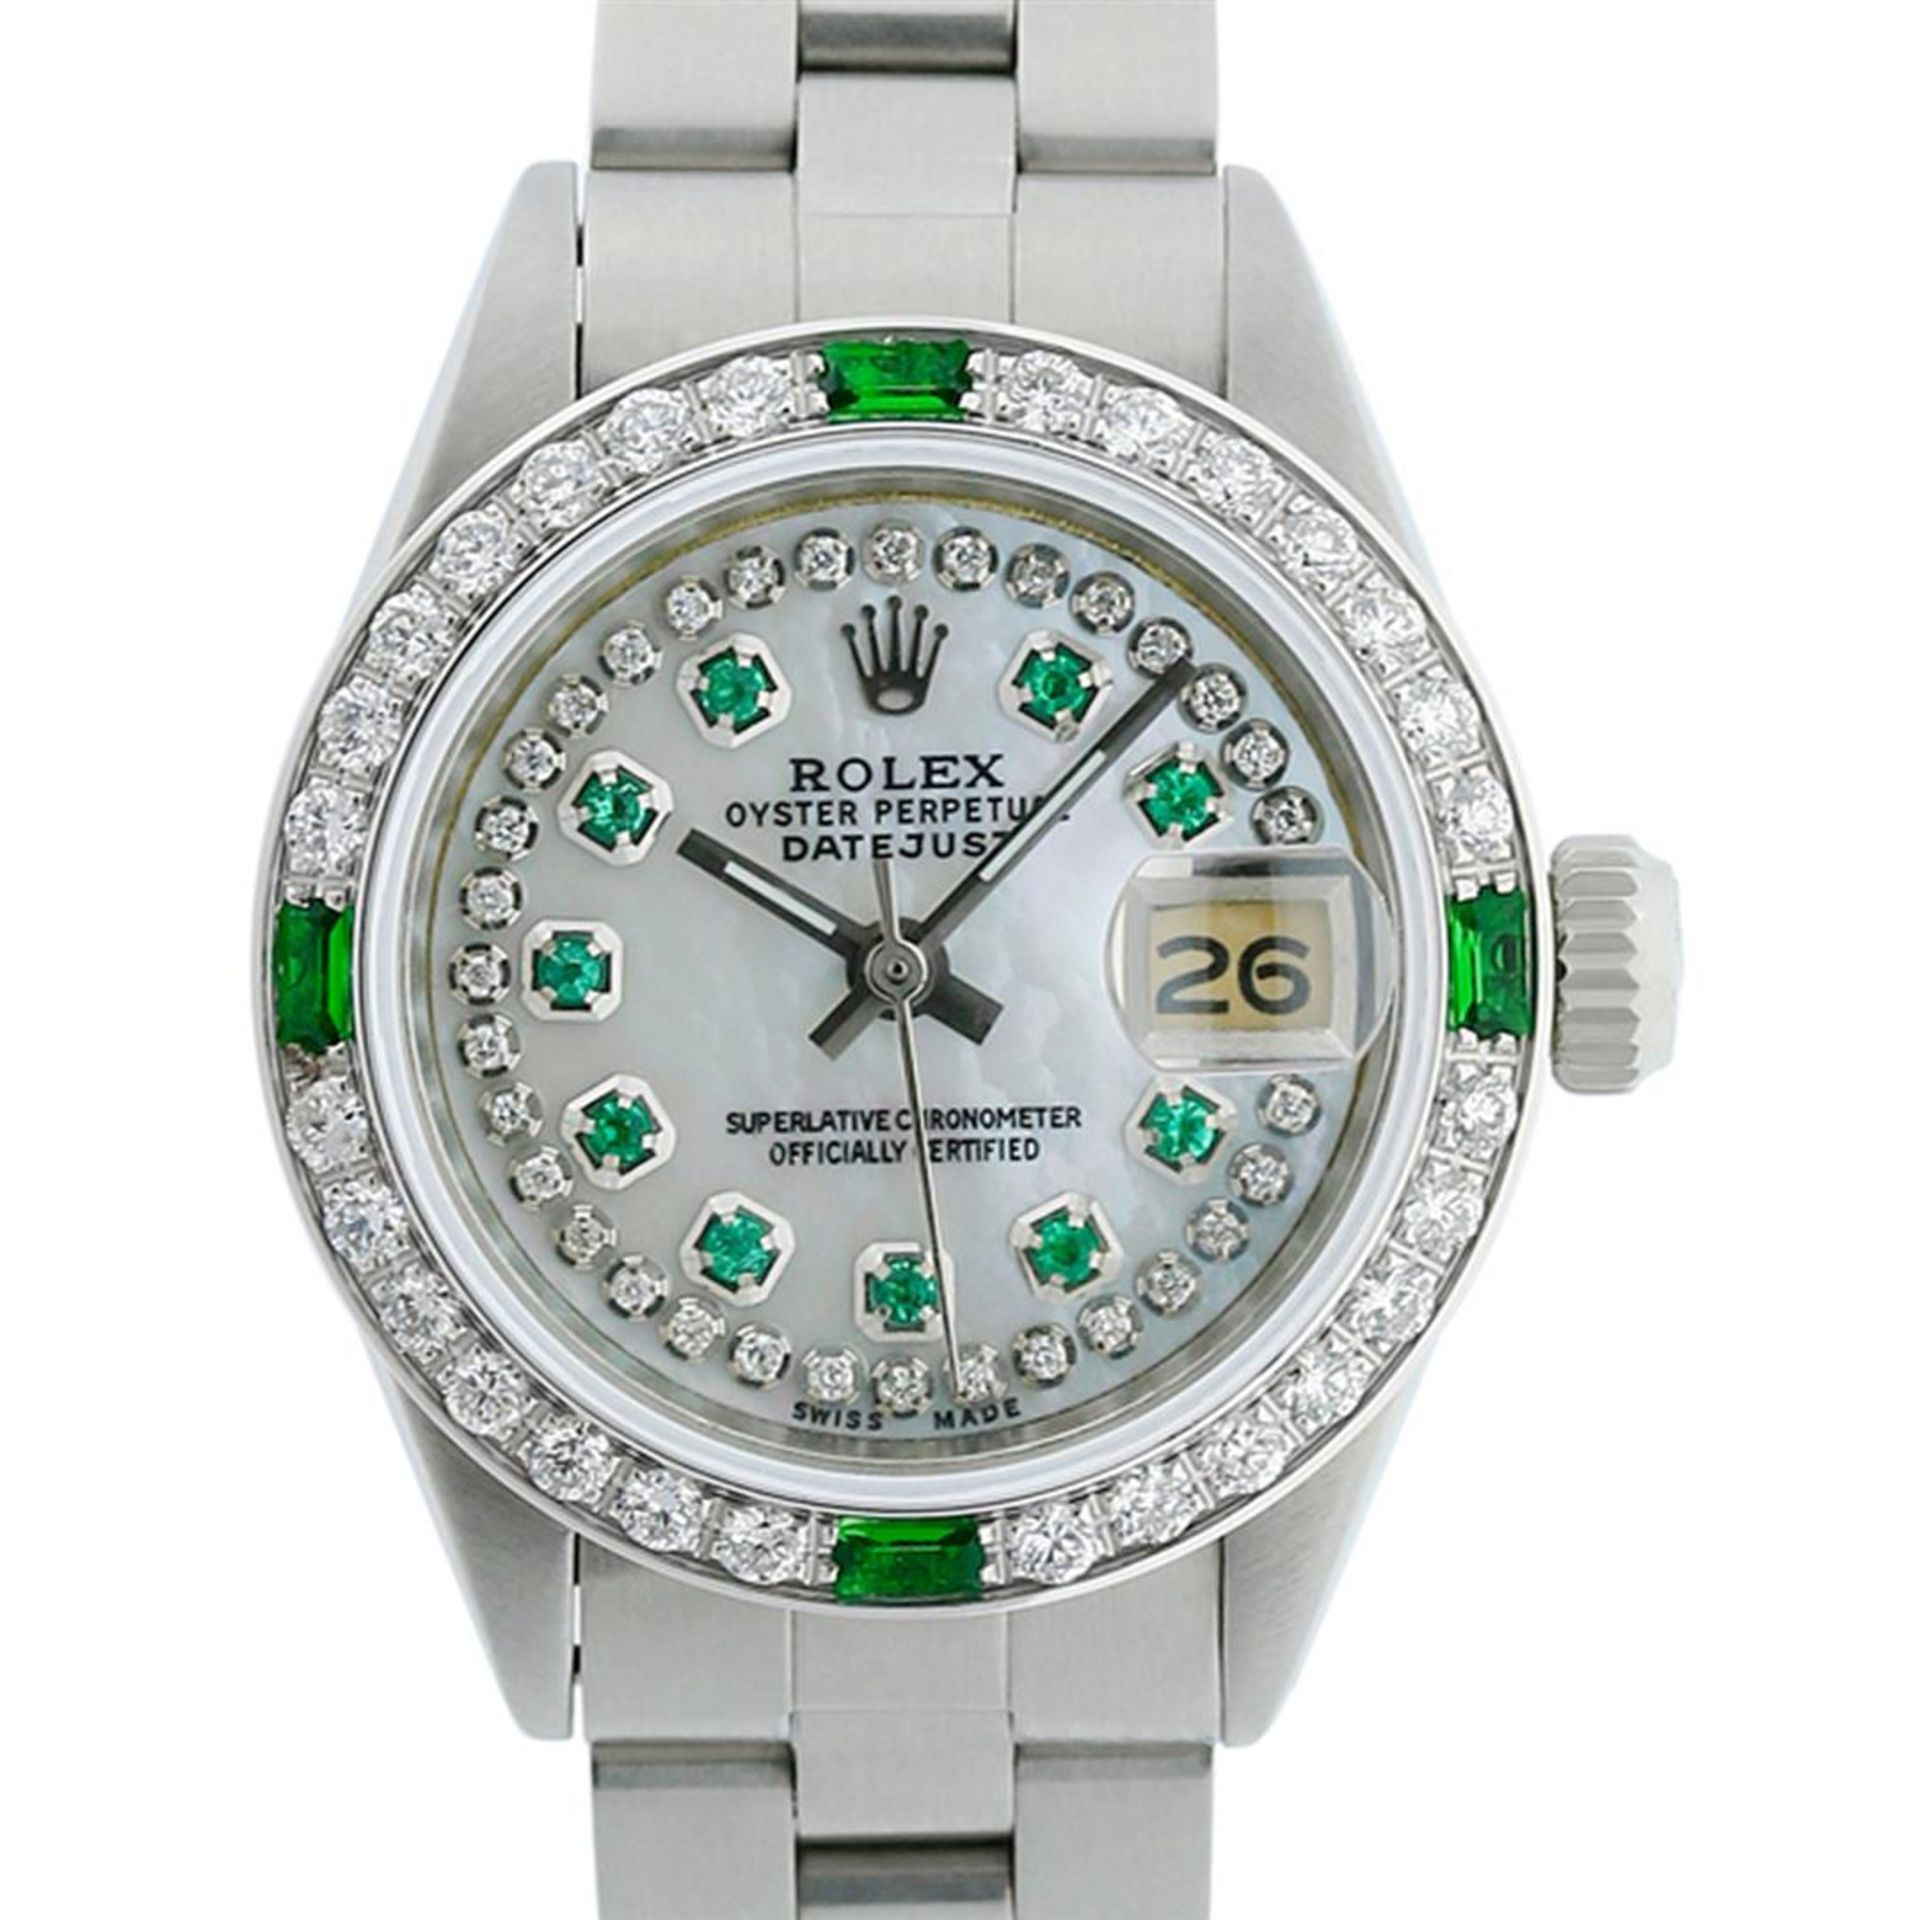 Rolex Ladies Stainless Steel MOP Emerald & Diamond Oyster Perpetaul Datejust Wri - Image 5 of 9